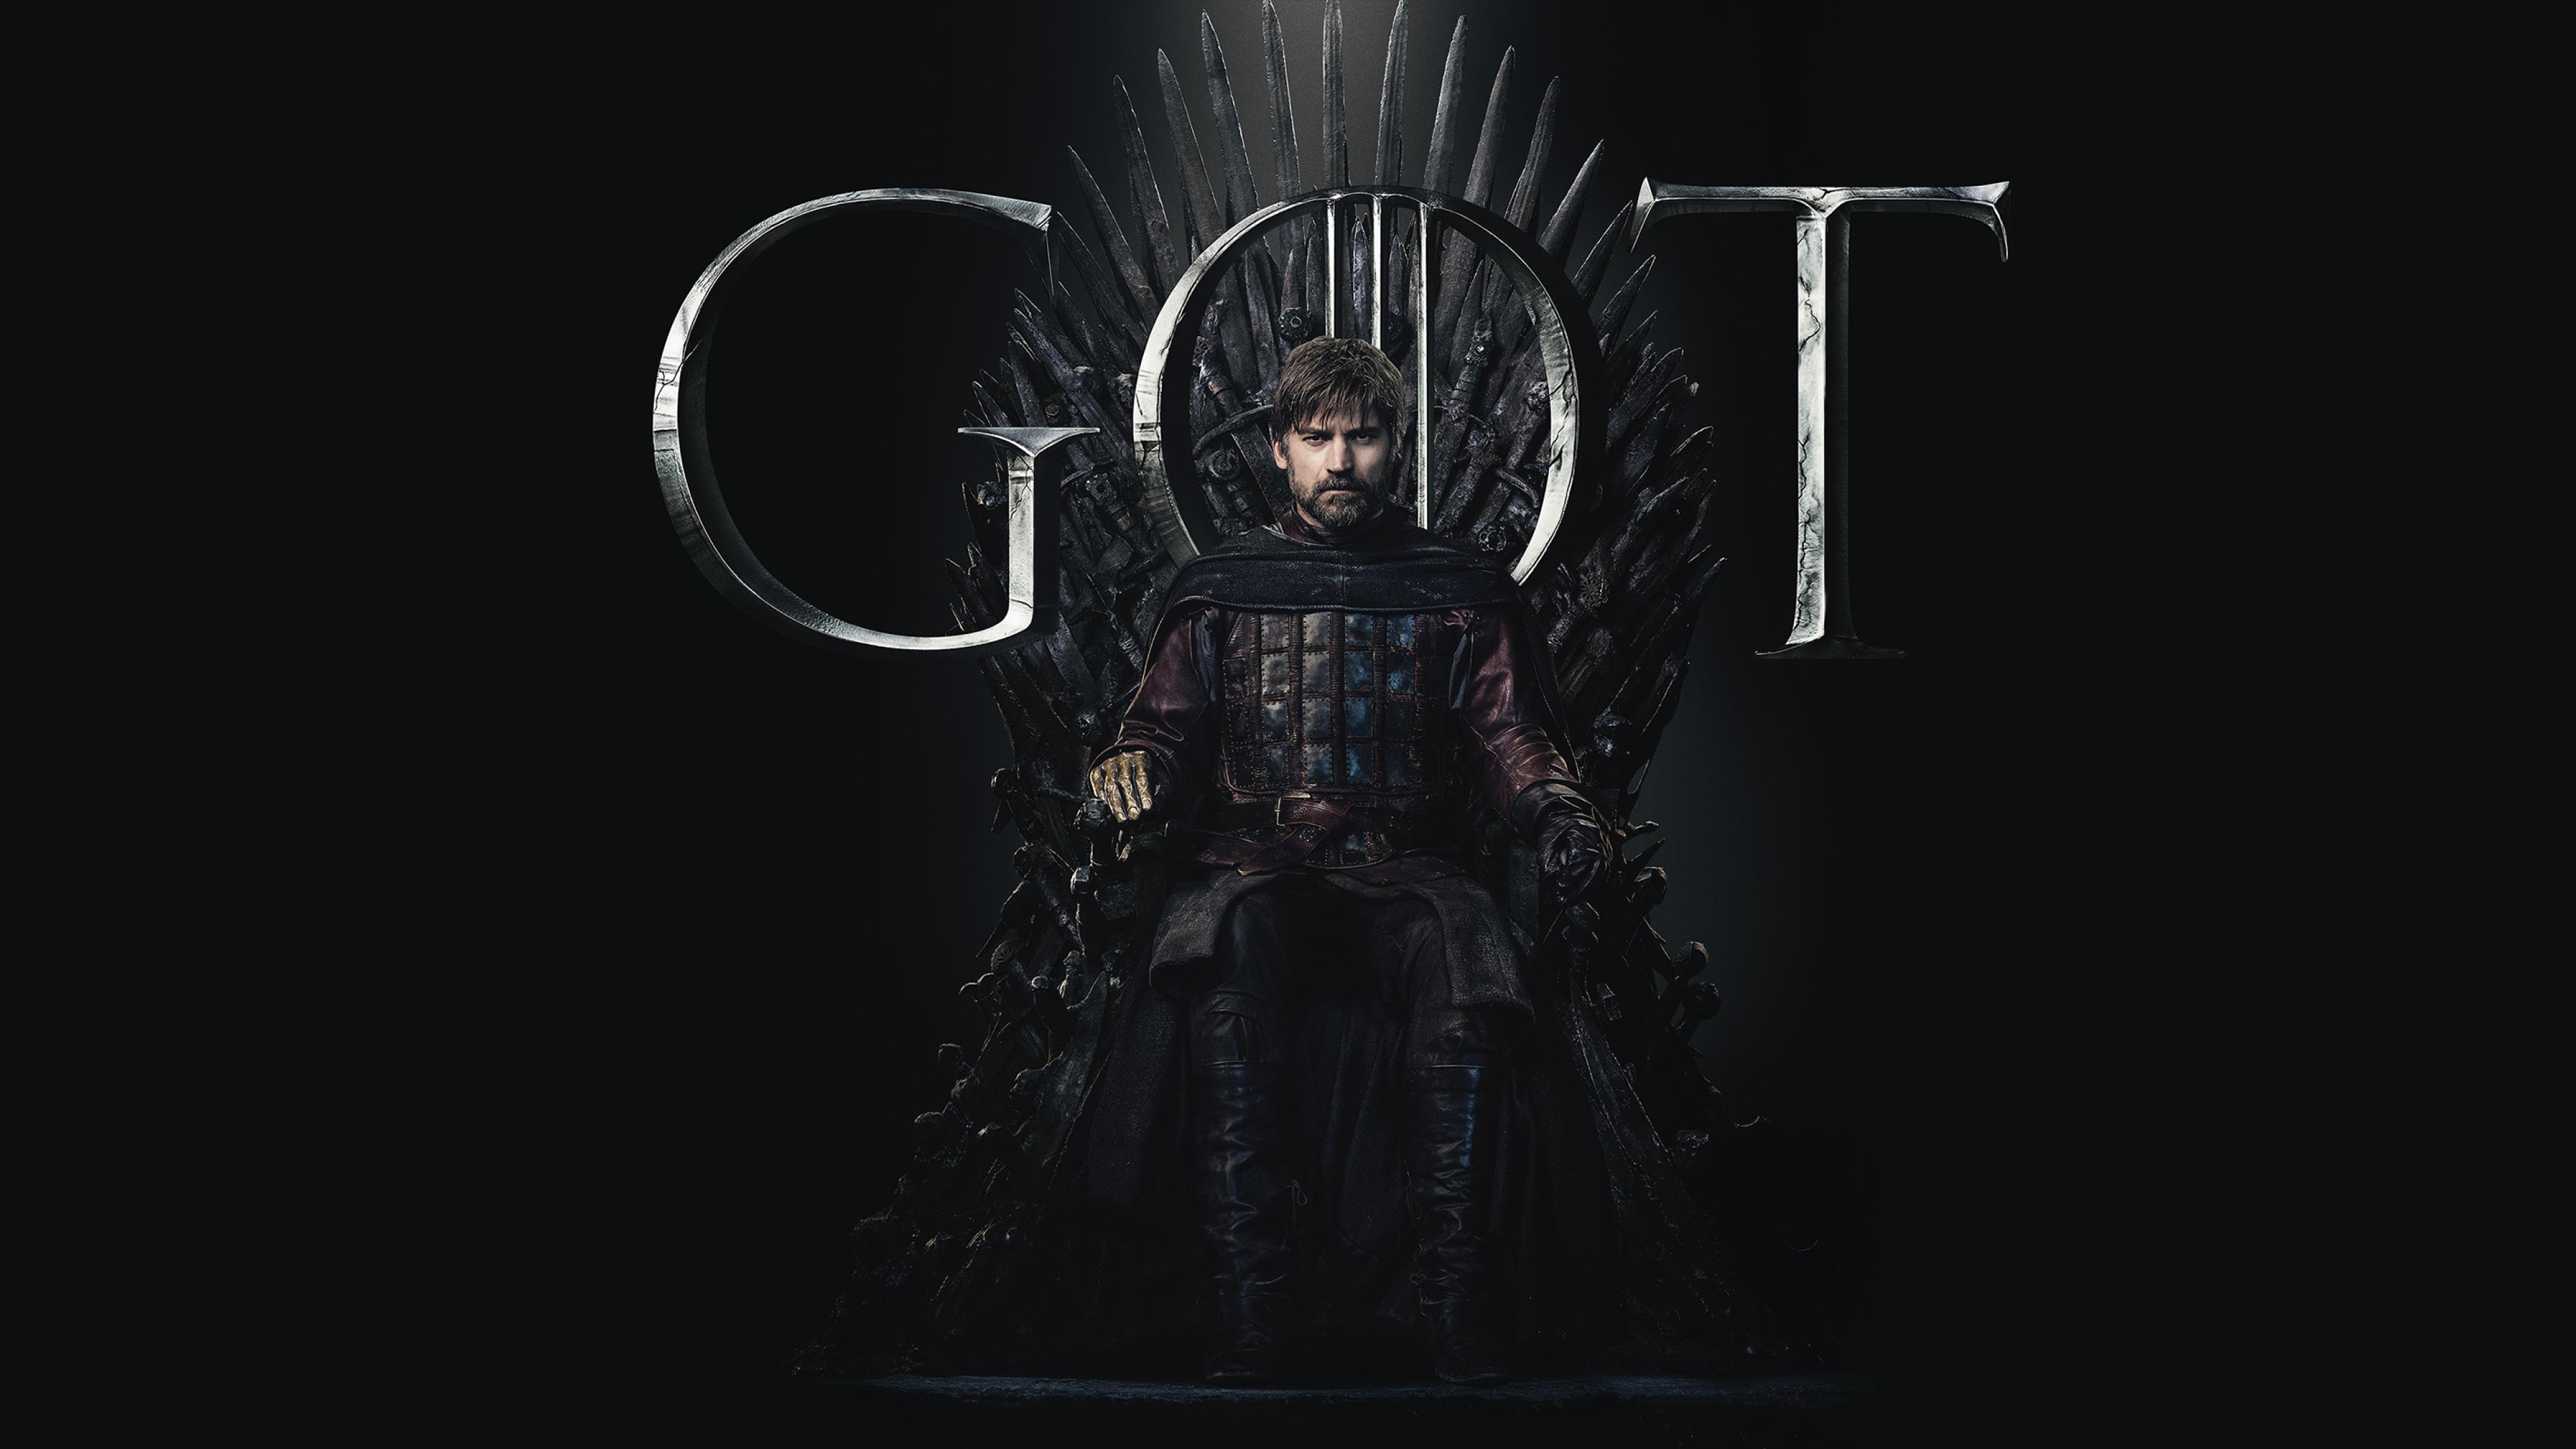 3840x2160 Jaime Lannister Game Of Thrones Season 8 Poster ...